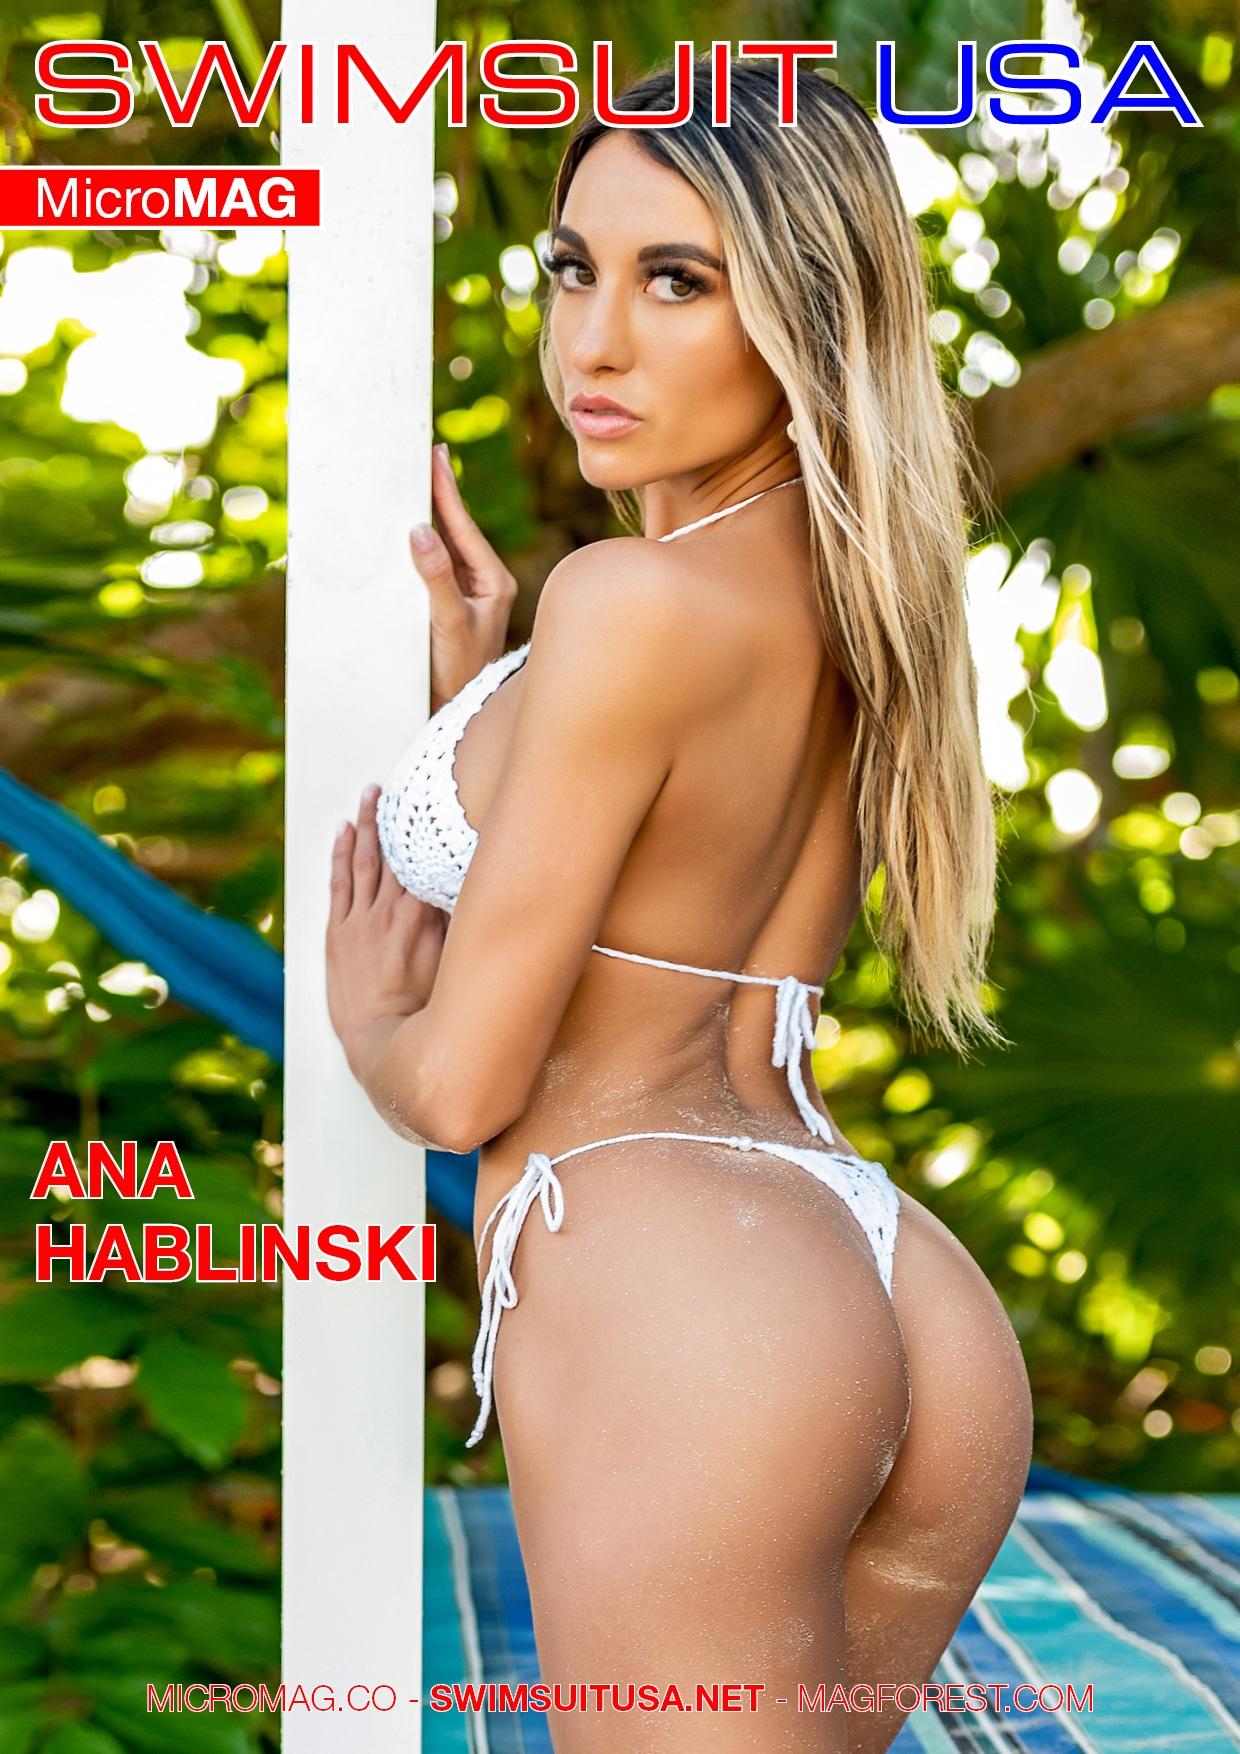 Swimsuit USA MicroMAG - Ana Hablinski - Issue 6 2